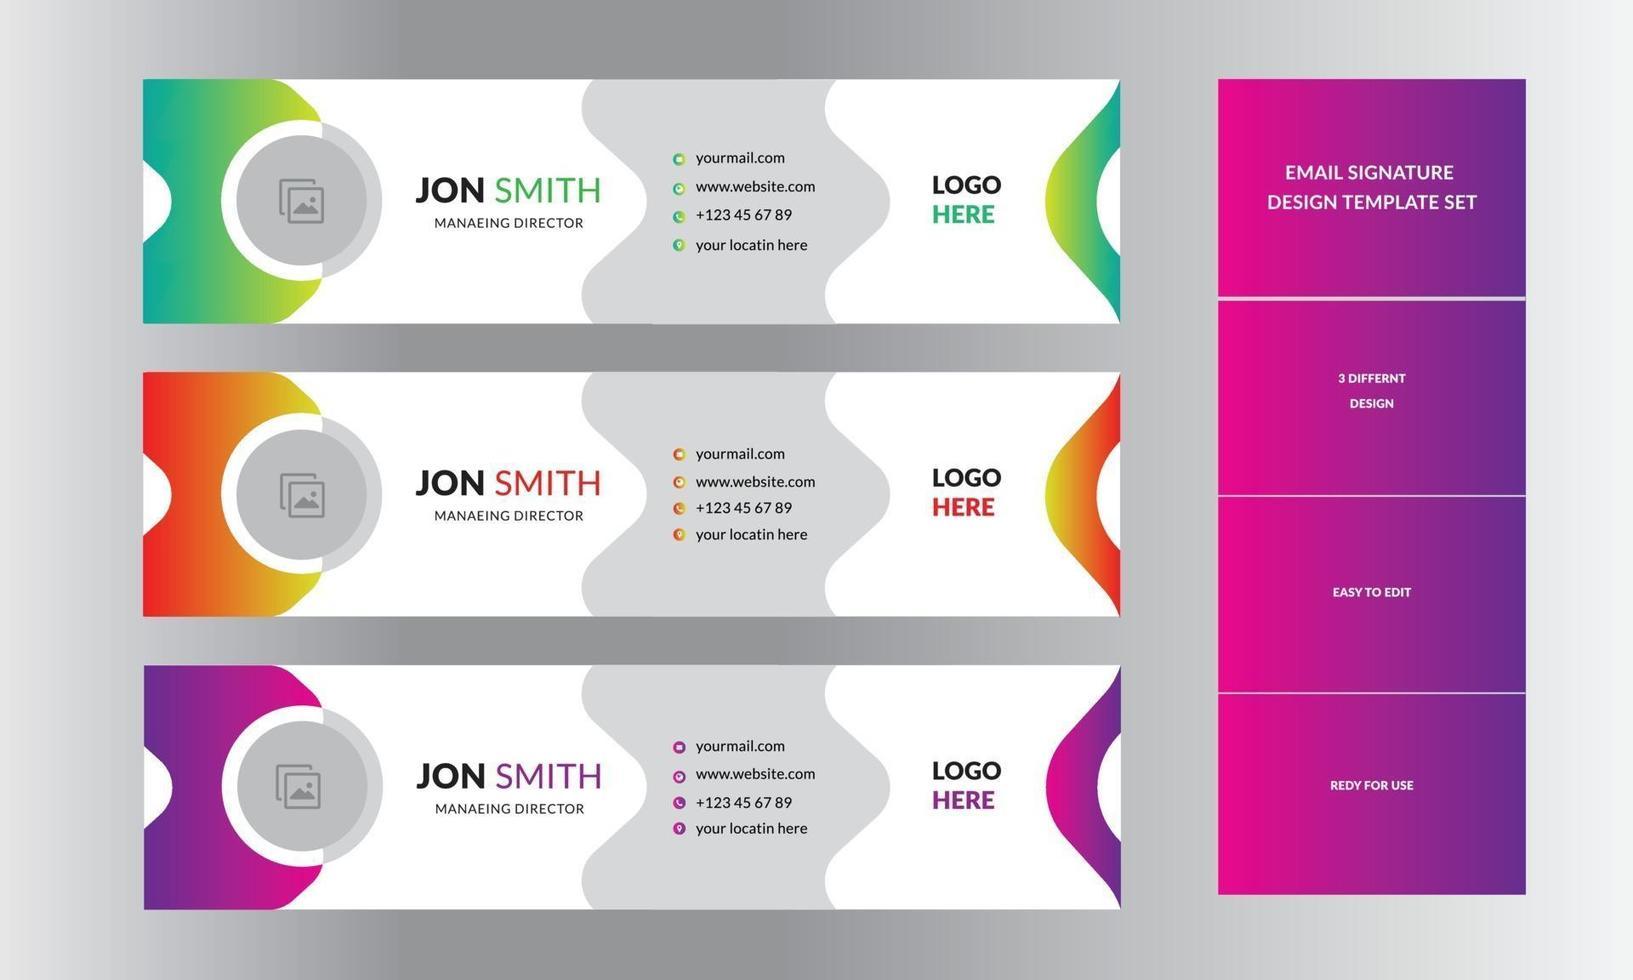 plantilla de firma de correo electrónico profesional de negocios diseño de diseño de correo vector